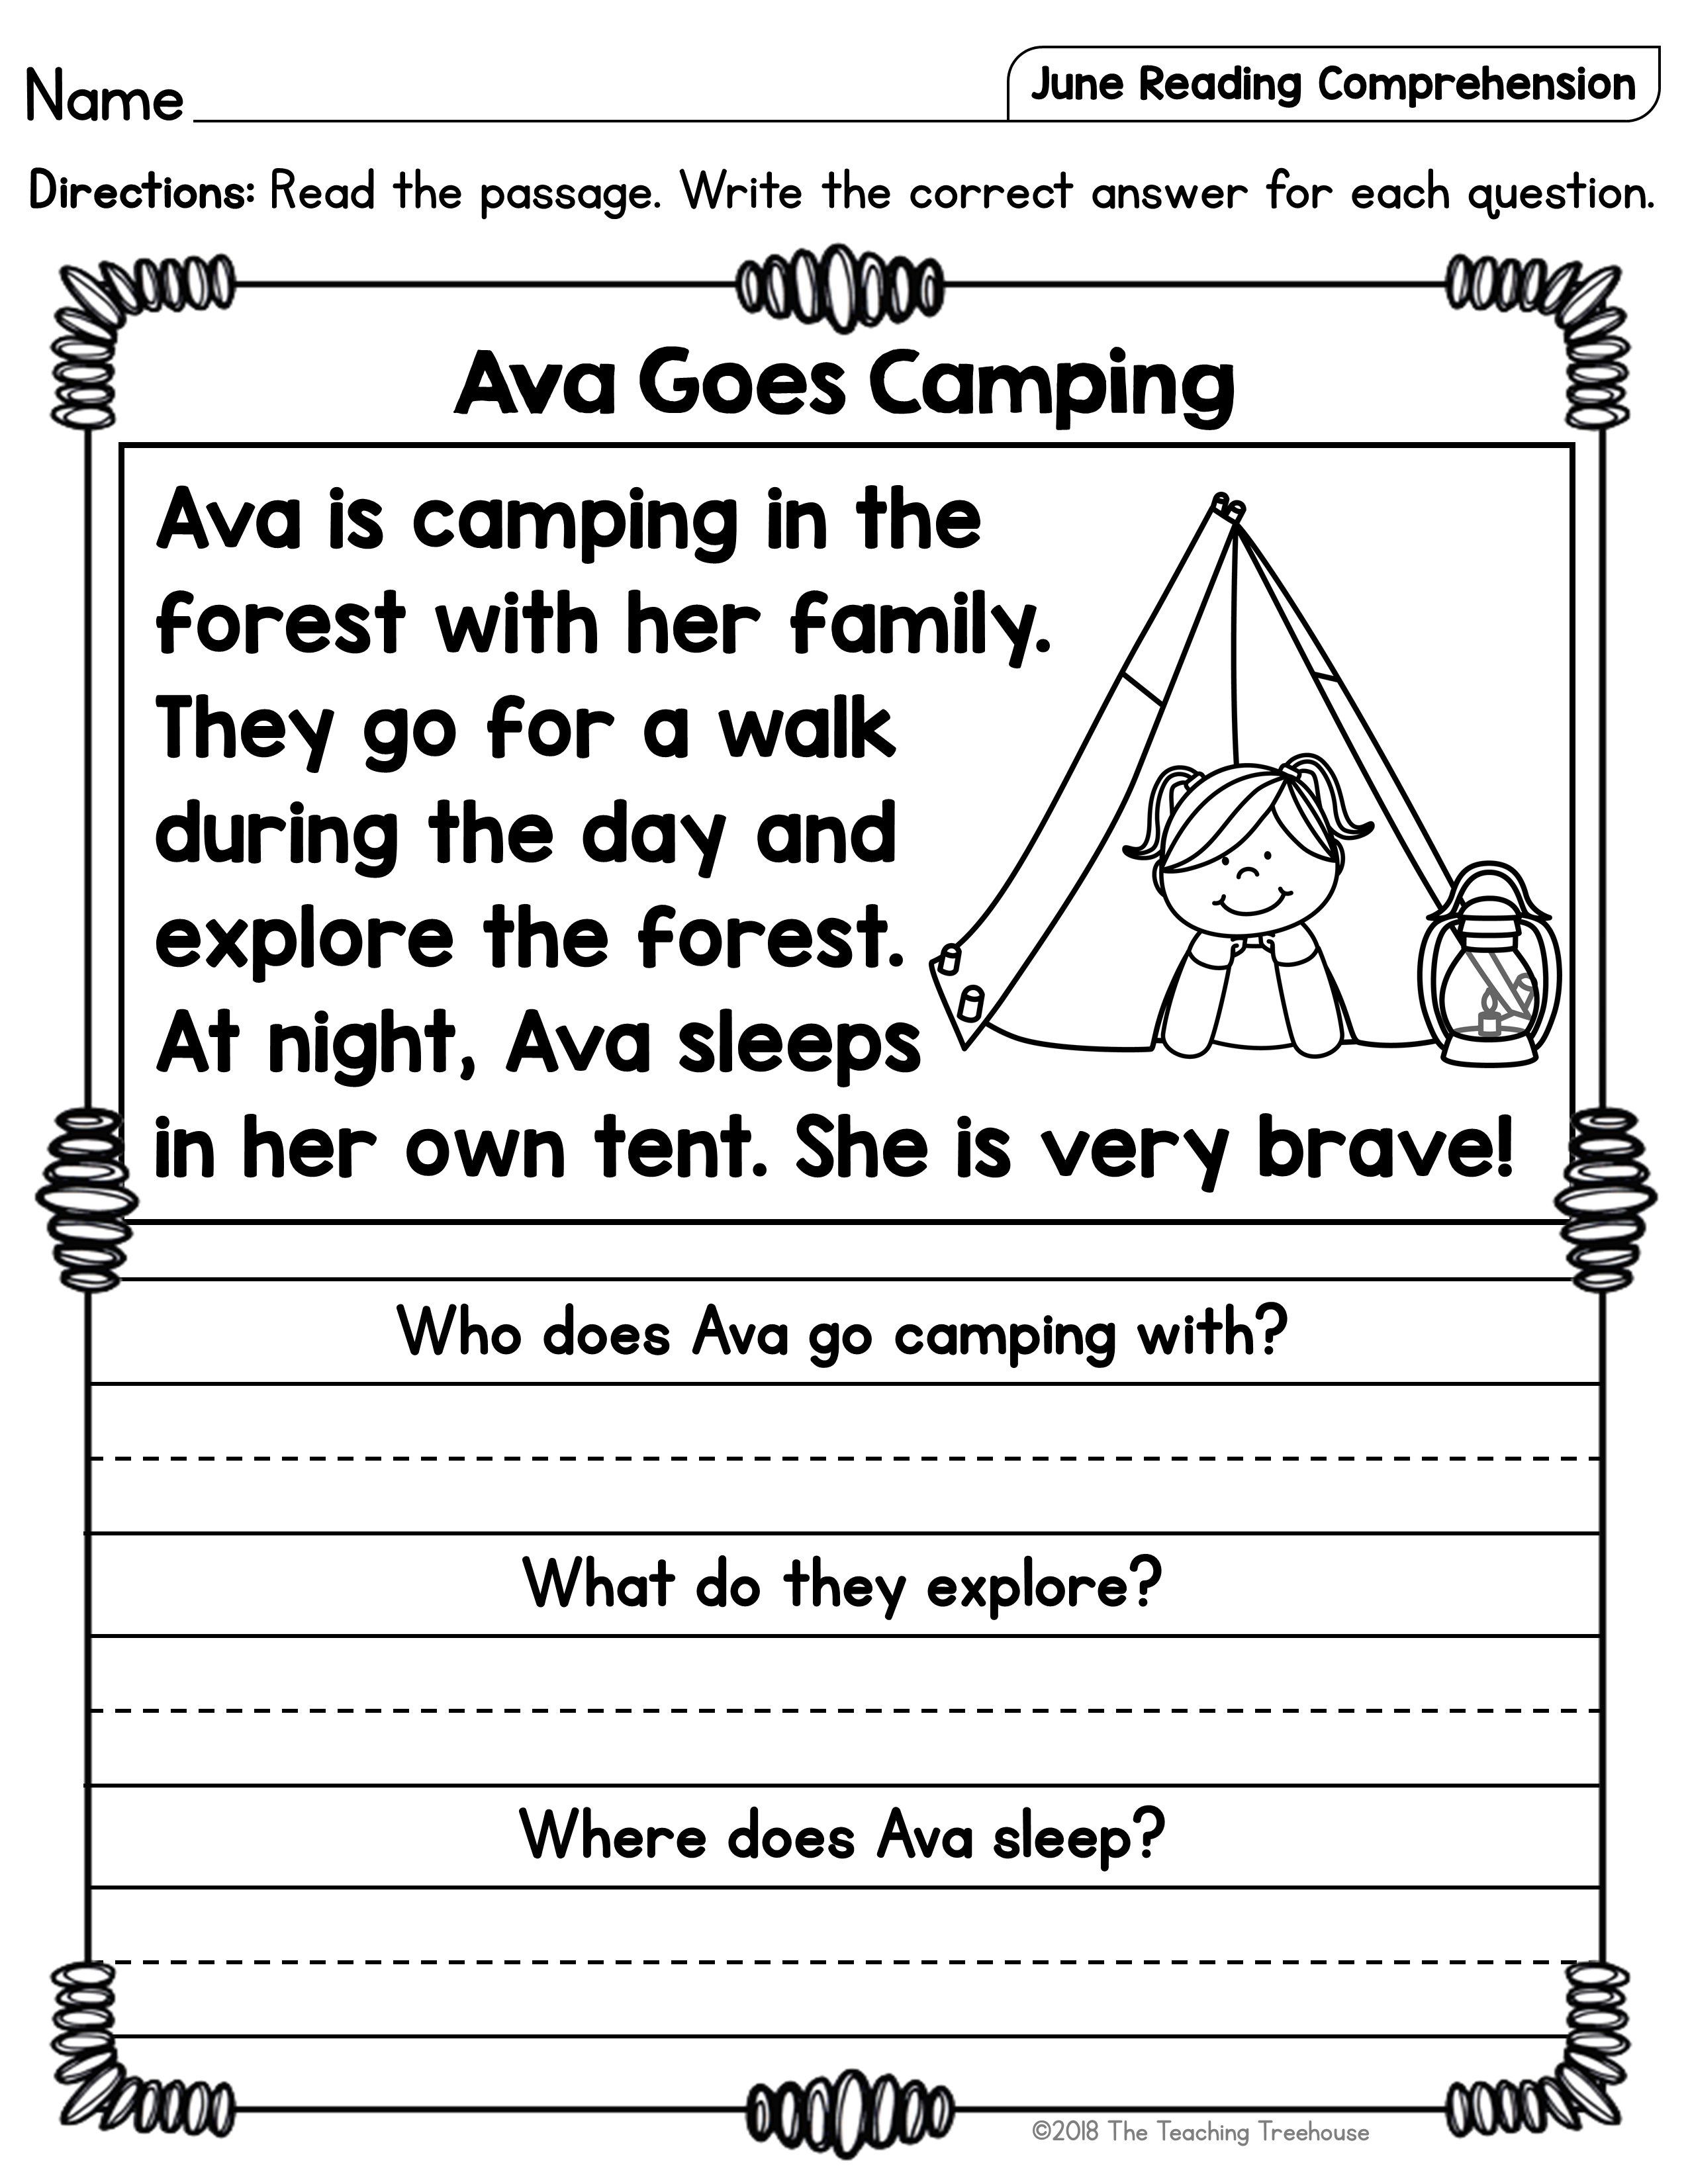 medium resolution of June Reading Comprehension Passages for Kindergarten and First Grade    Reading comprehension worksheets